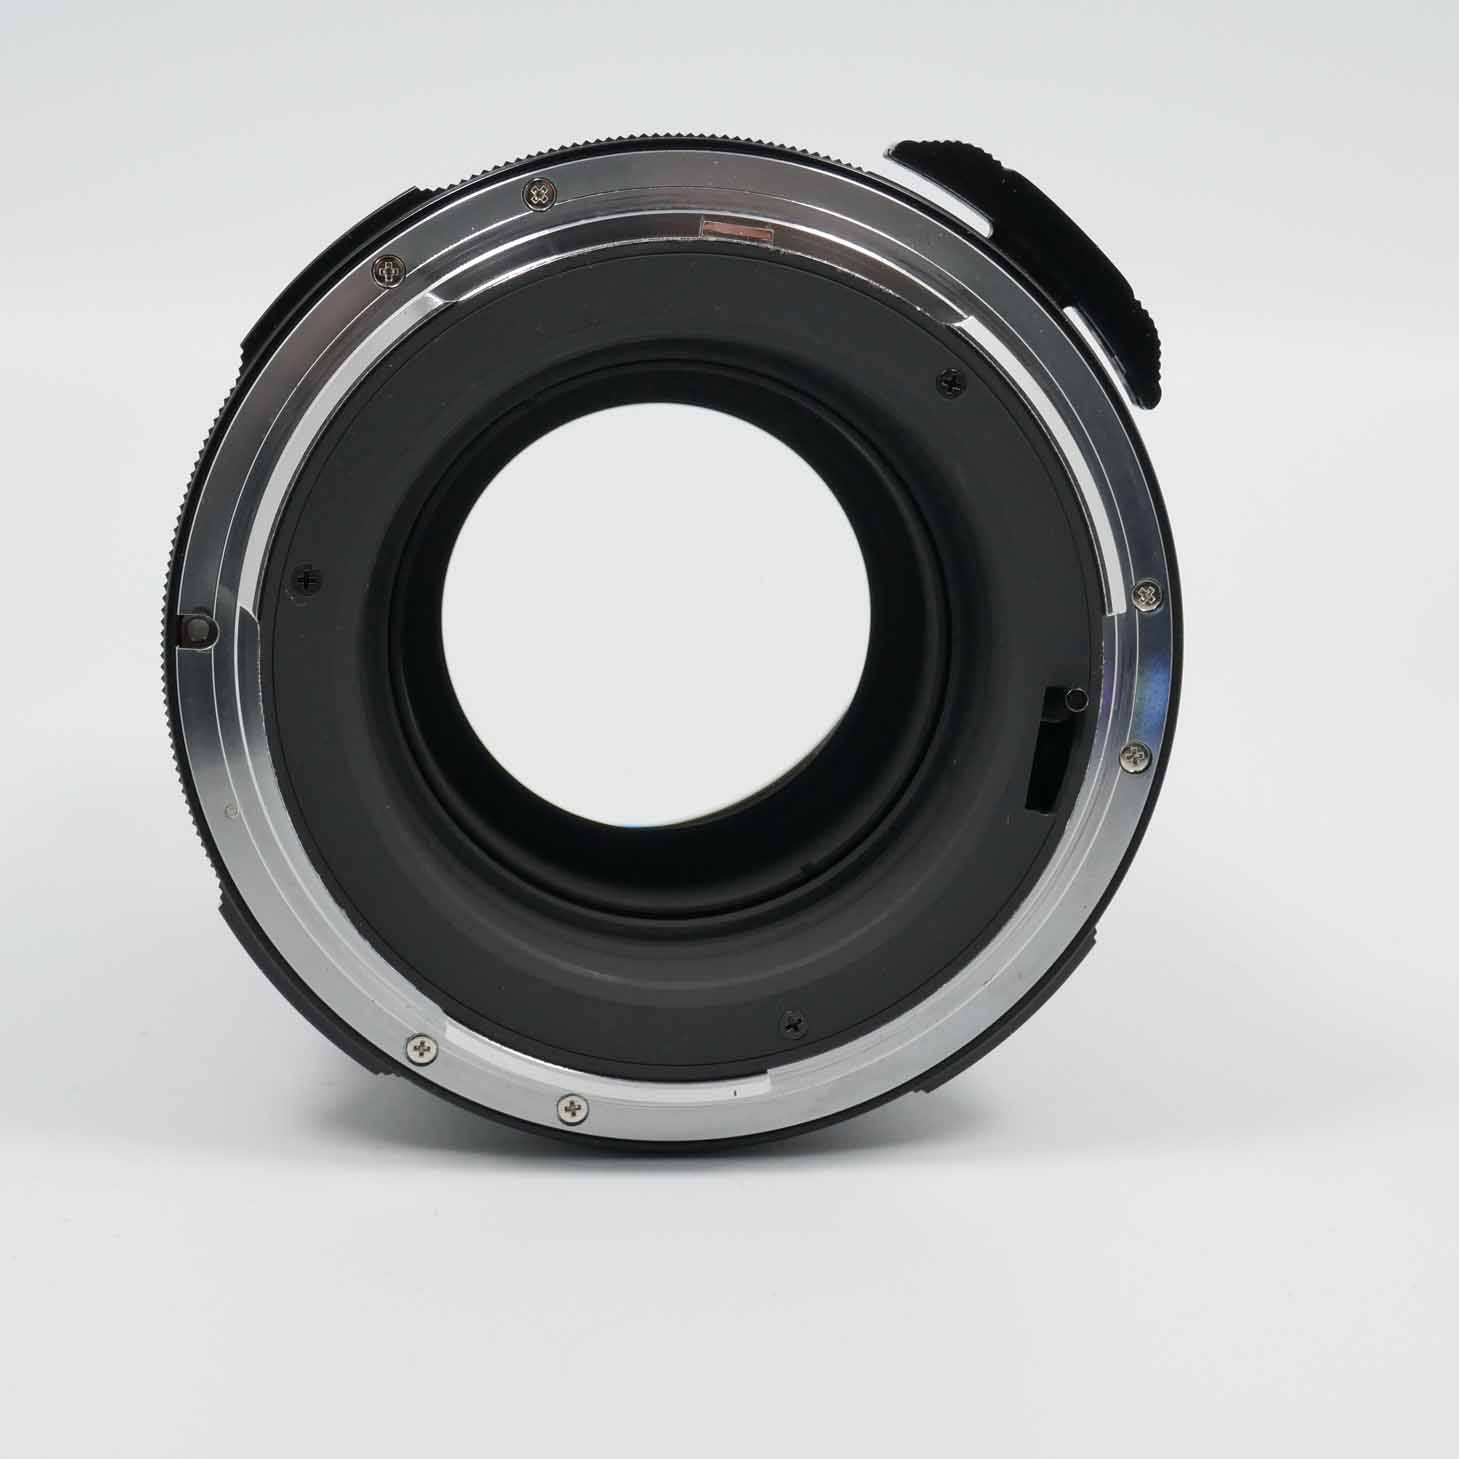 clean-cameras-Pentax-67-165mm-2.8-05